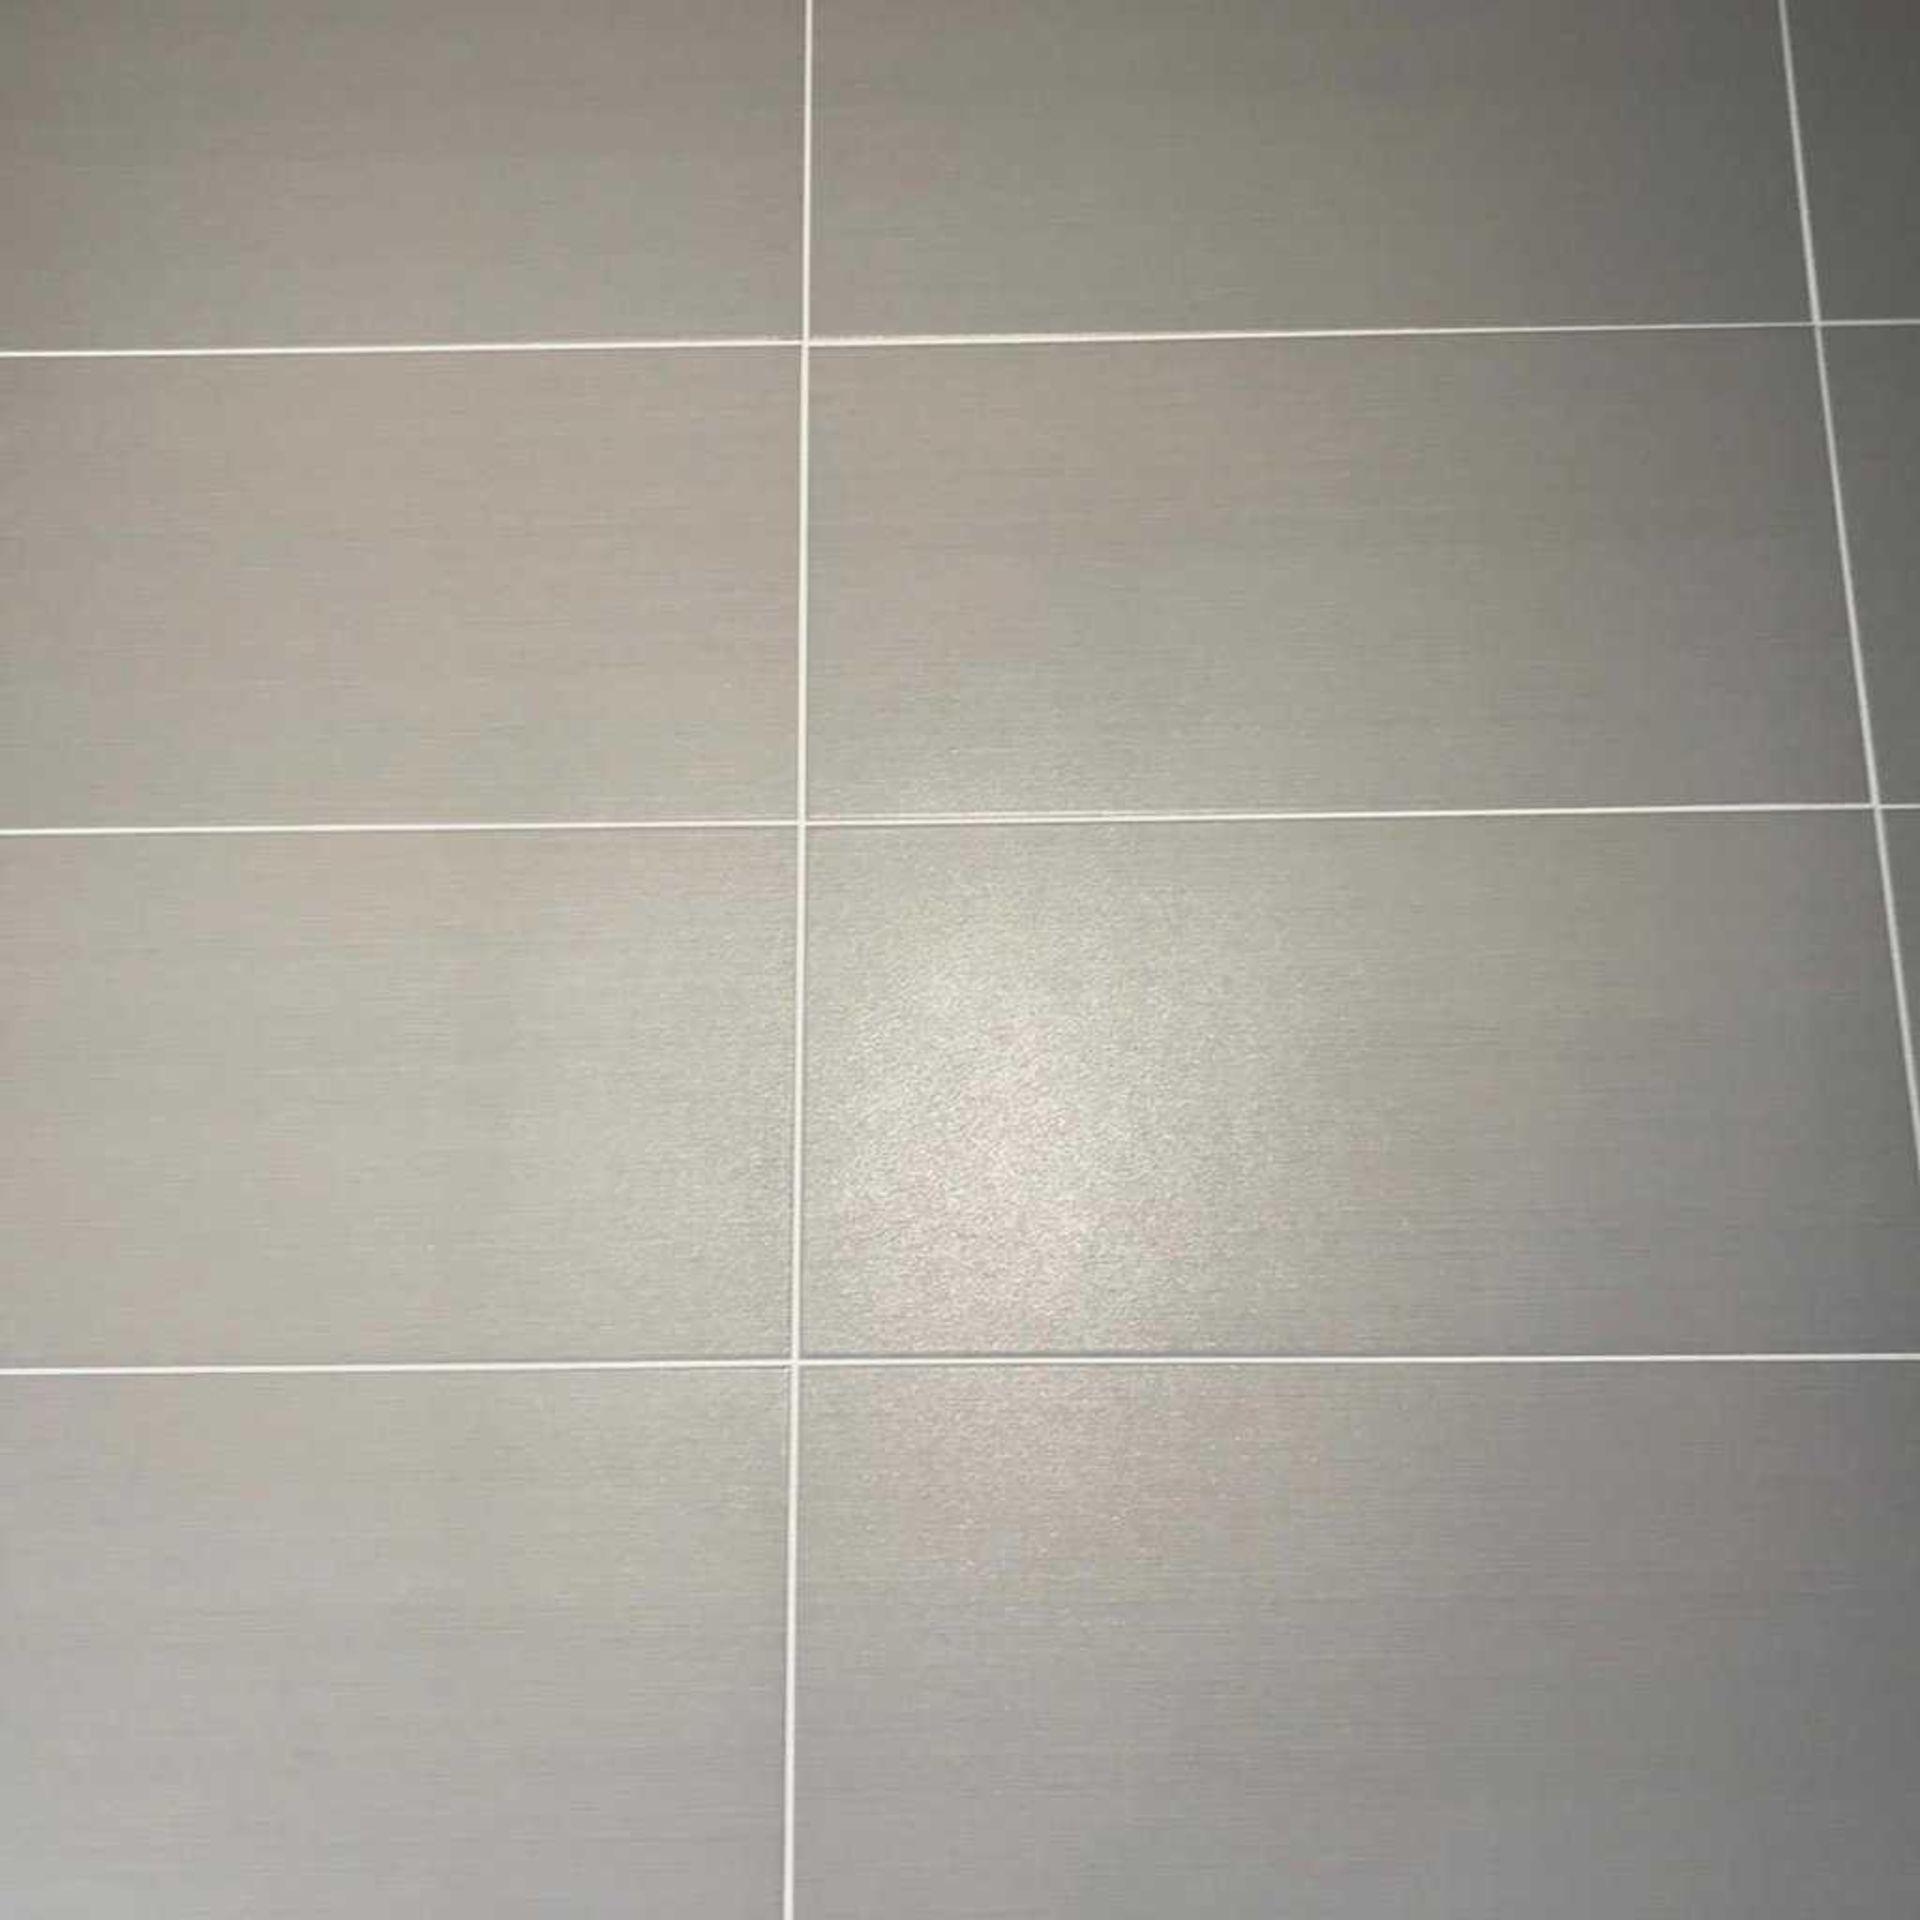 RRP £1000 Pallet To Contain 40 Packs Of 5 Johnson's Lat12A Latitude Smoke Satin Tiles (